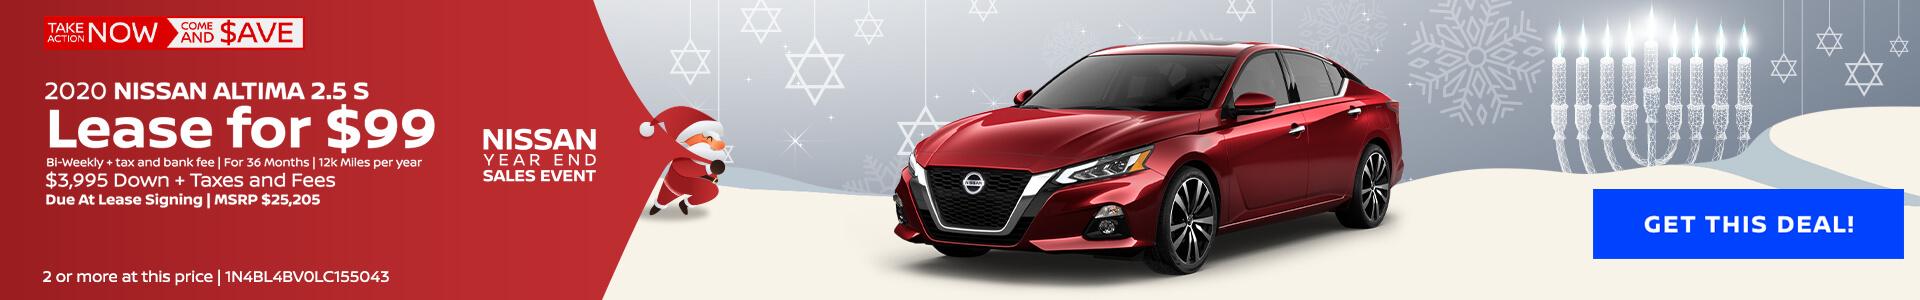 Nissan Altima $105 Lease